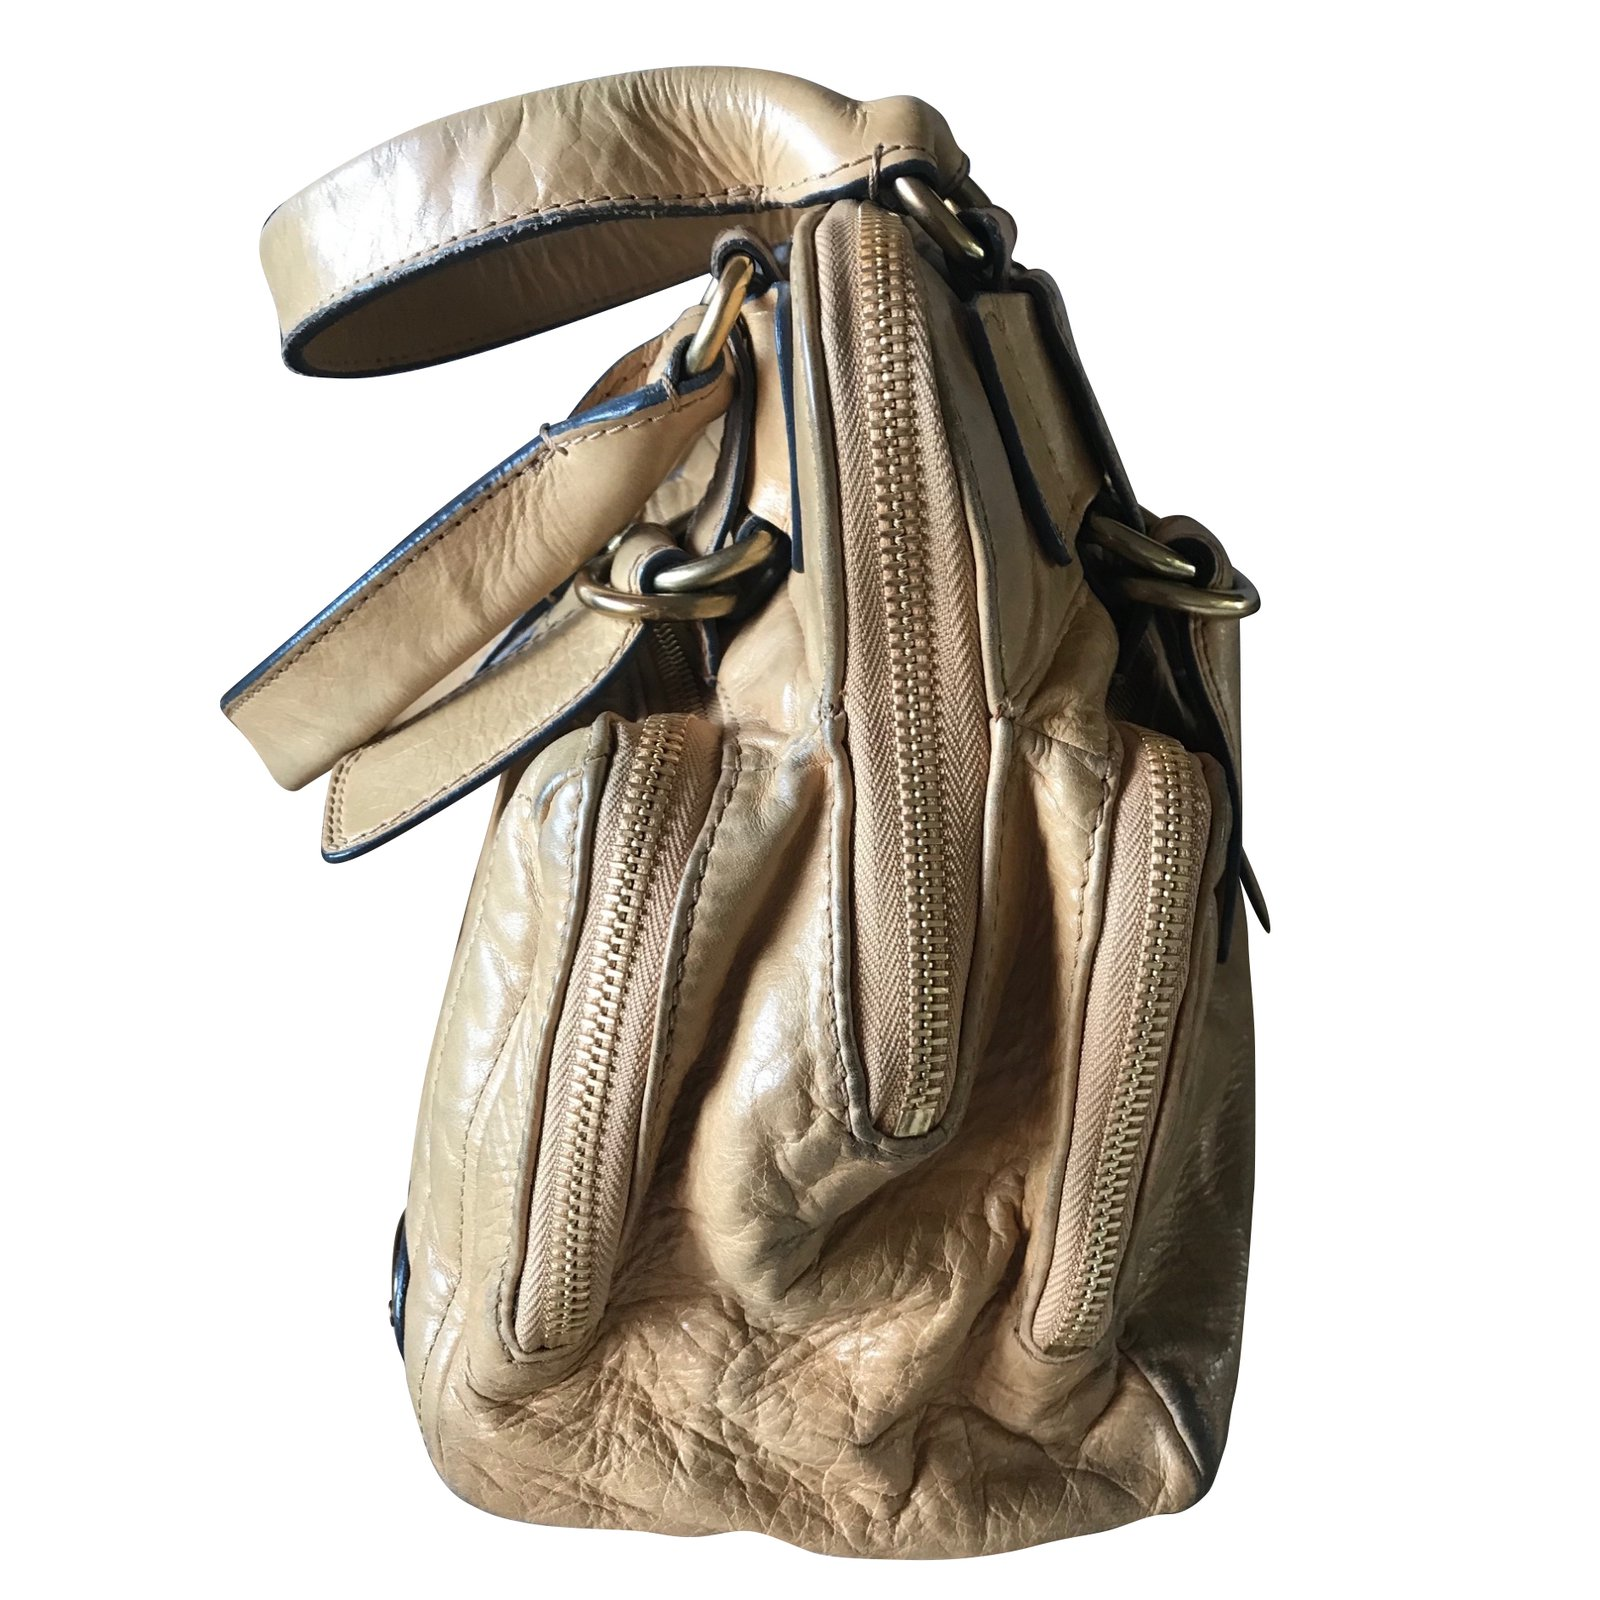 2abbaf4dbc Facebook · Pin This. Chloé Bay bag Handbags Leather Beige ref.60130